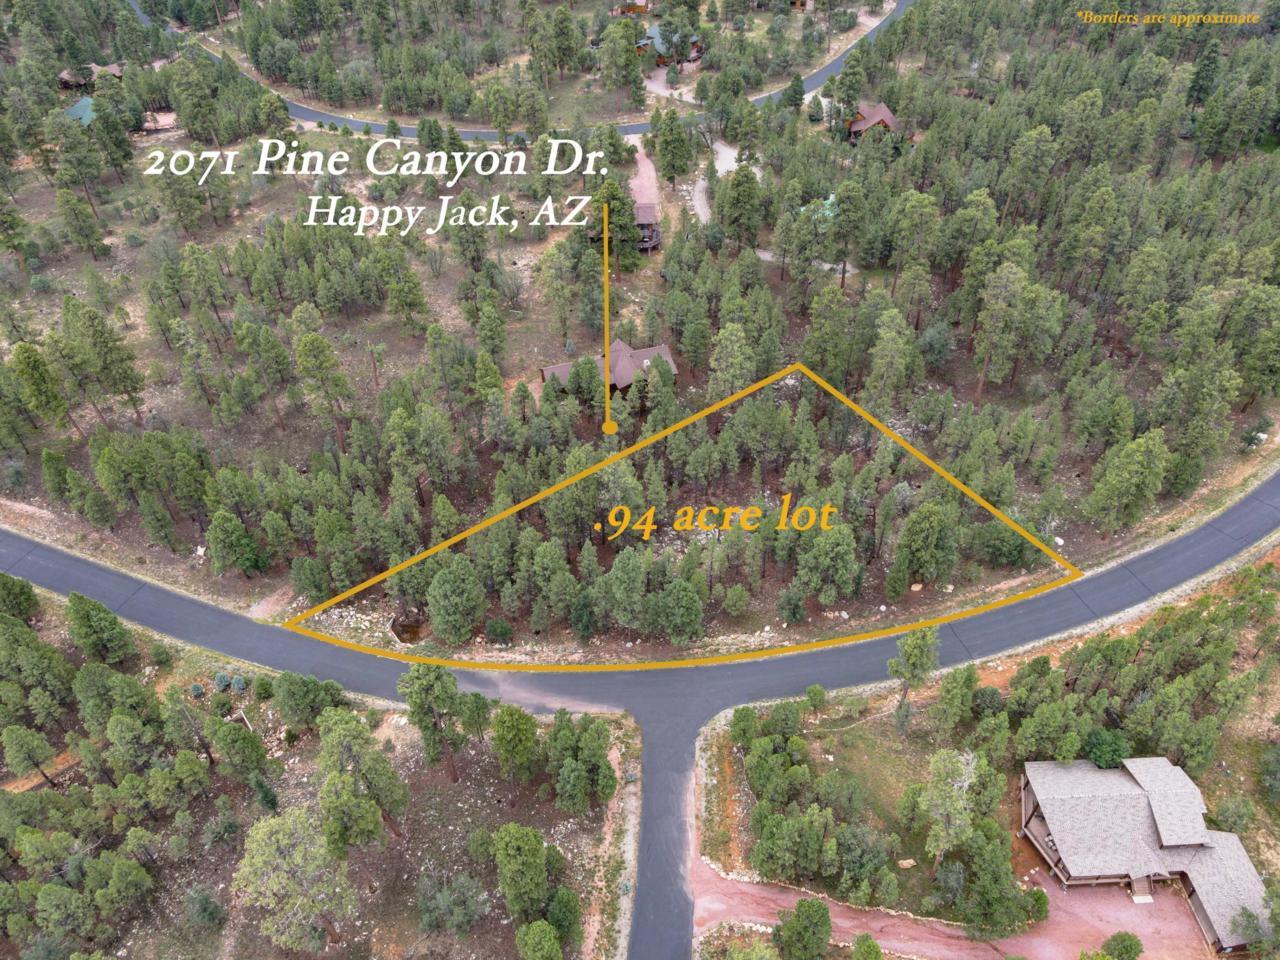 2071 Pine Canyon Drive - Photo 1